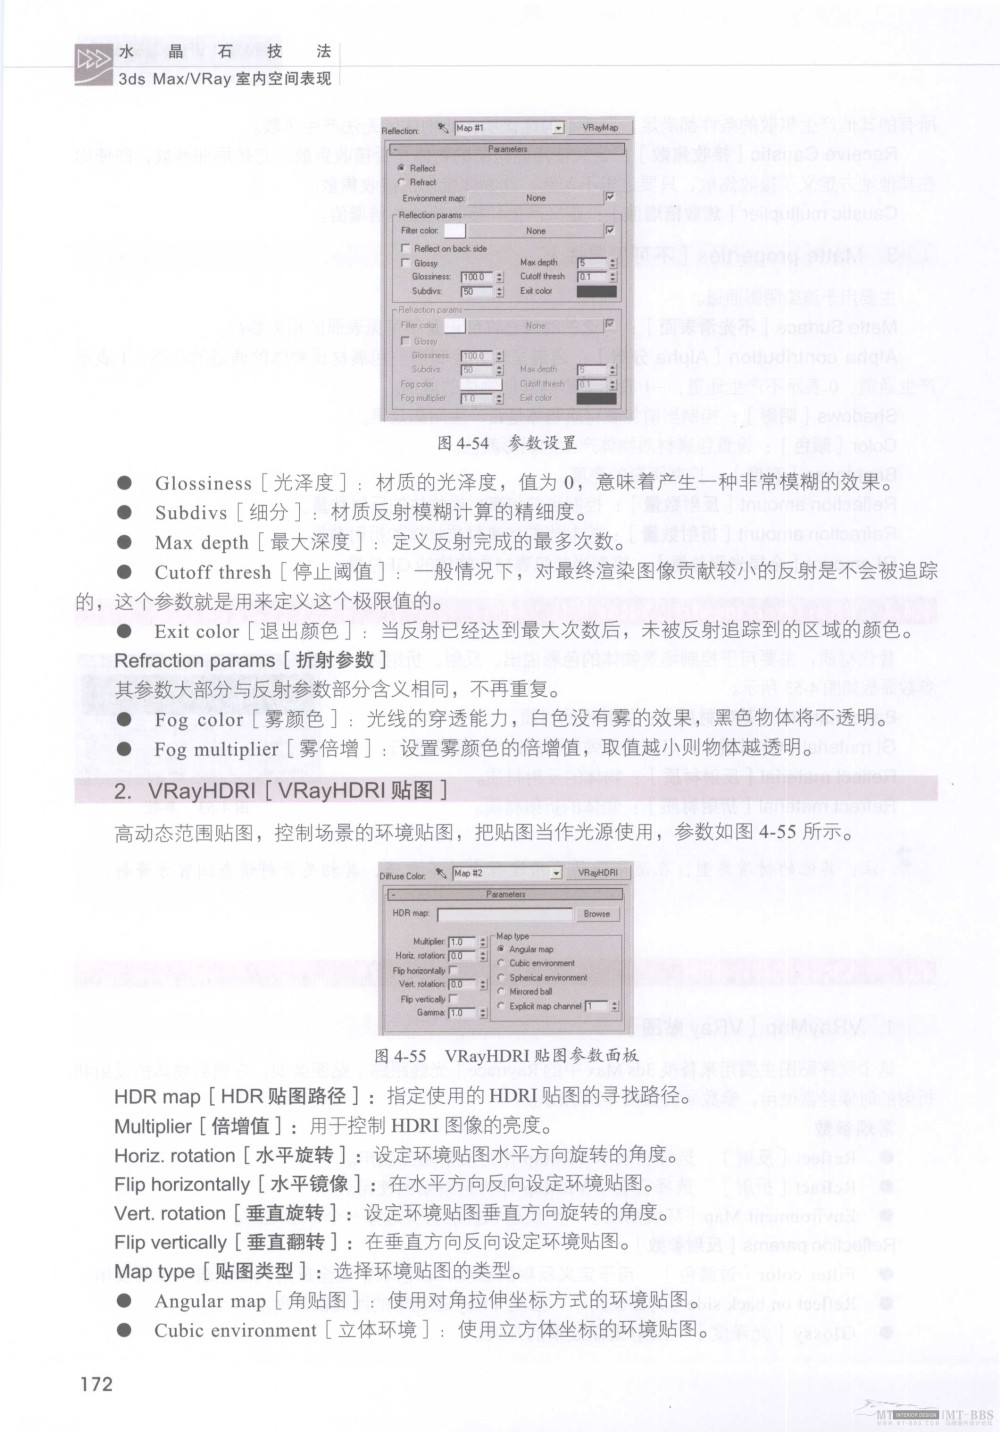 水晶石技法-3ds_Max&VRay室内空间表现_水晶石技法-3ds_Max&VRay室内空间表现_页面_178.jpg